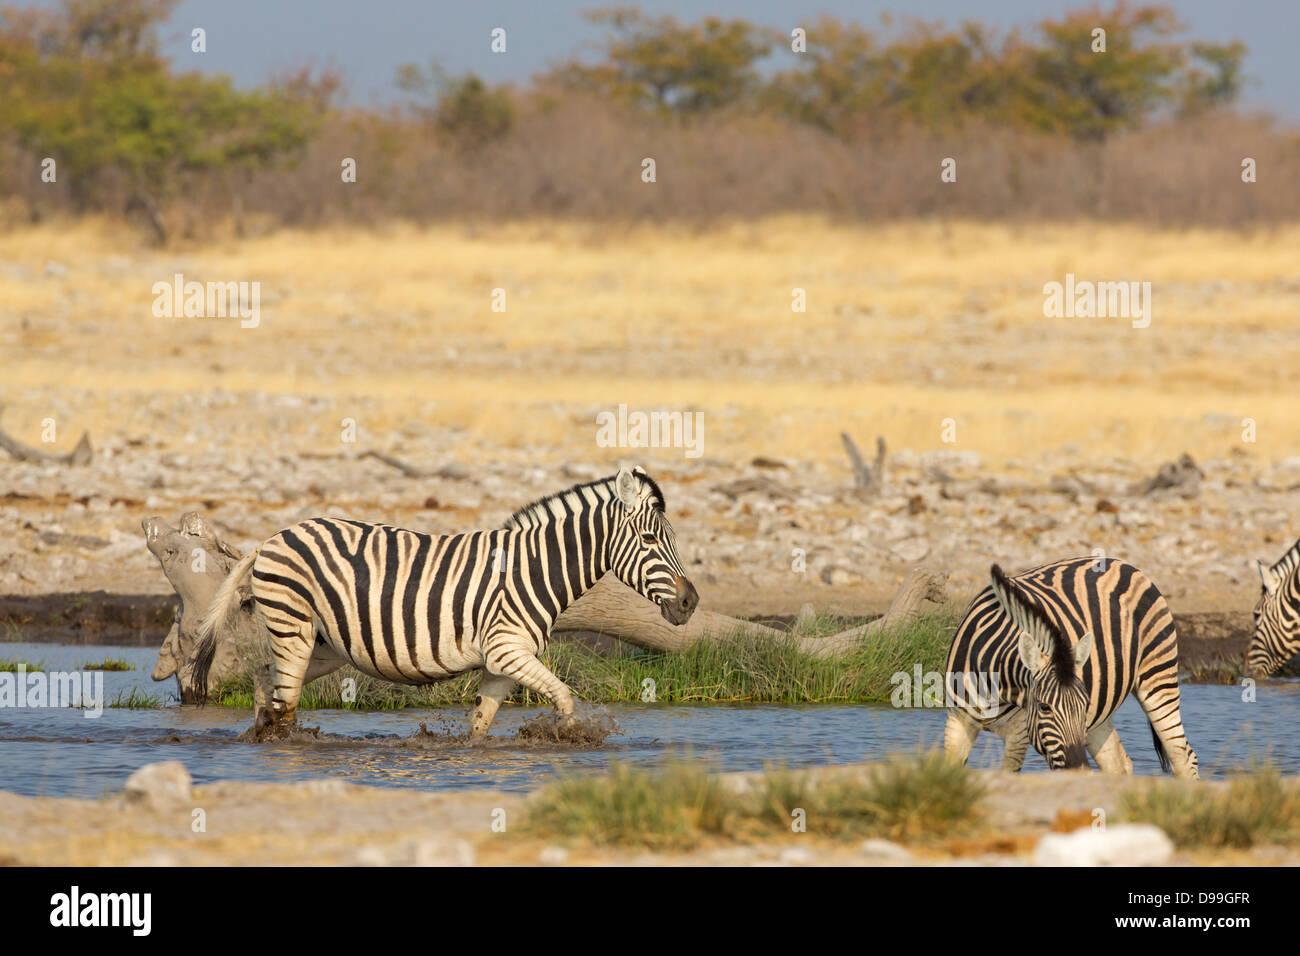 Ebenen Zebra, gemeinsame Zebra, Burchell Zebra, Equus Quagga, Ebenen Zebra, gemeinsame Zebra, Burchell Zebra, Steppenzebra, Stockbild